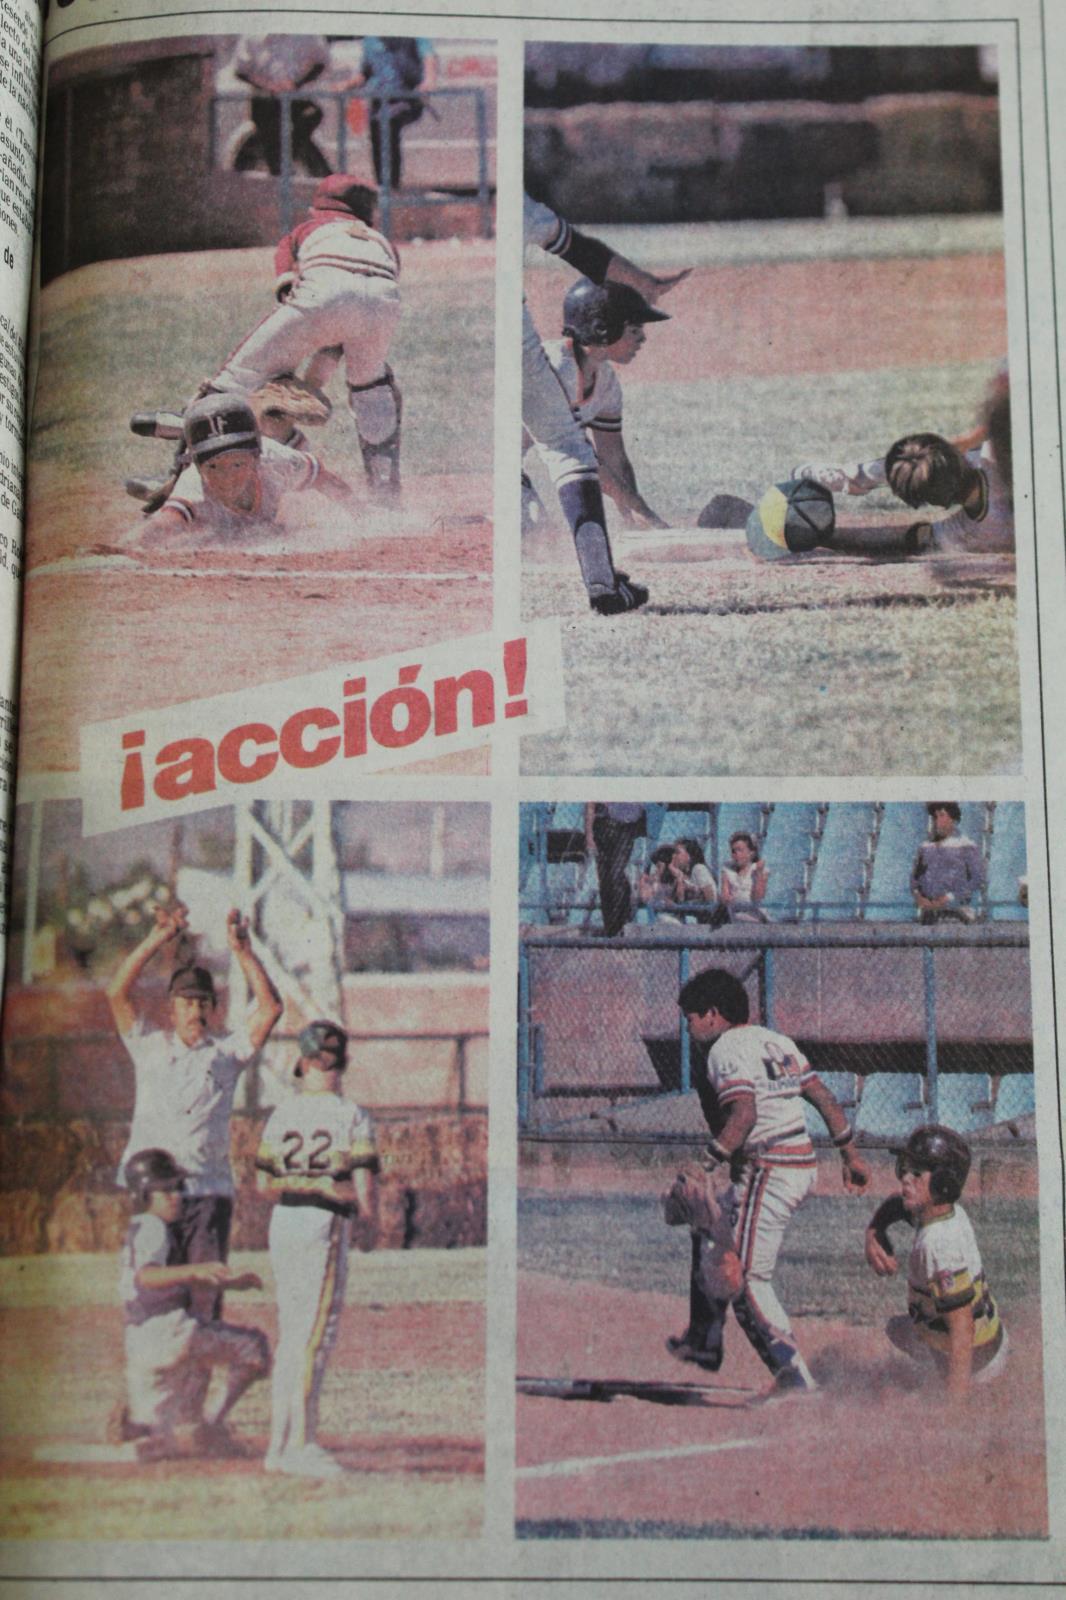 IMG 1974